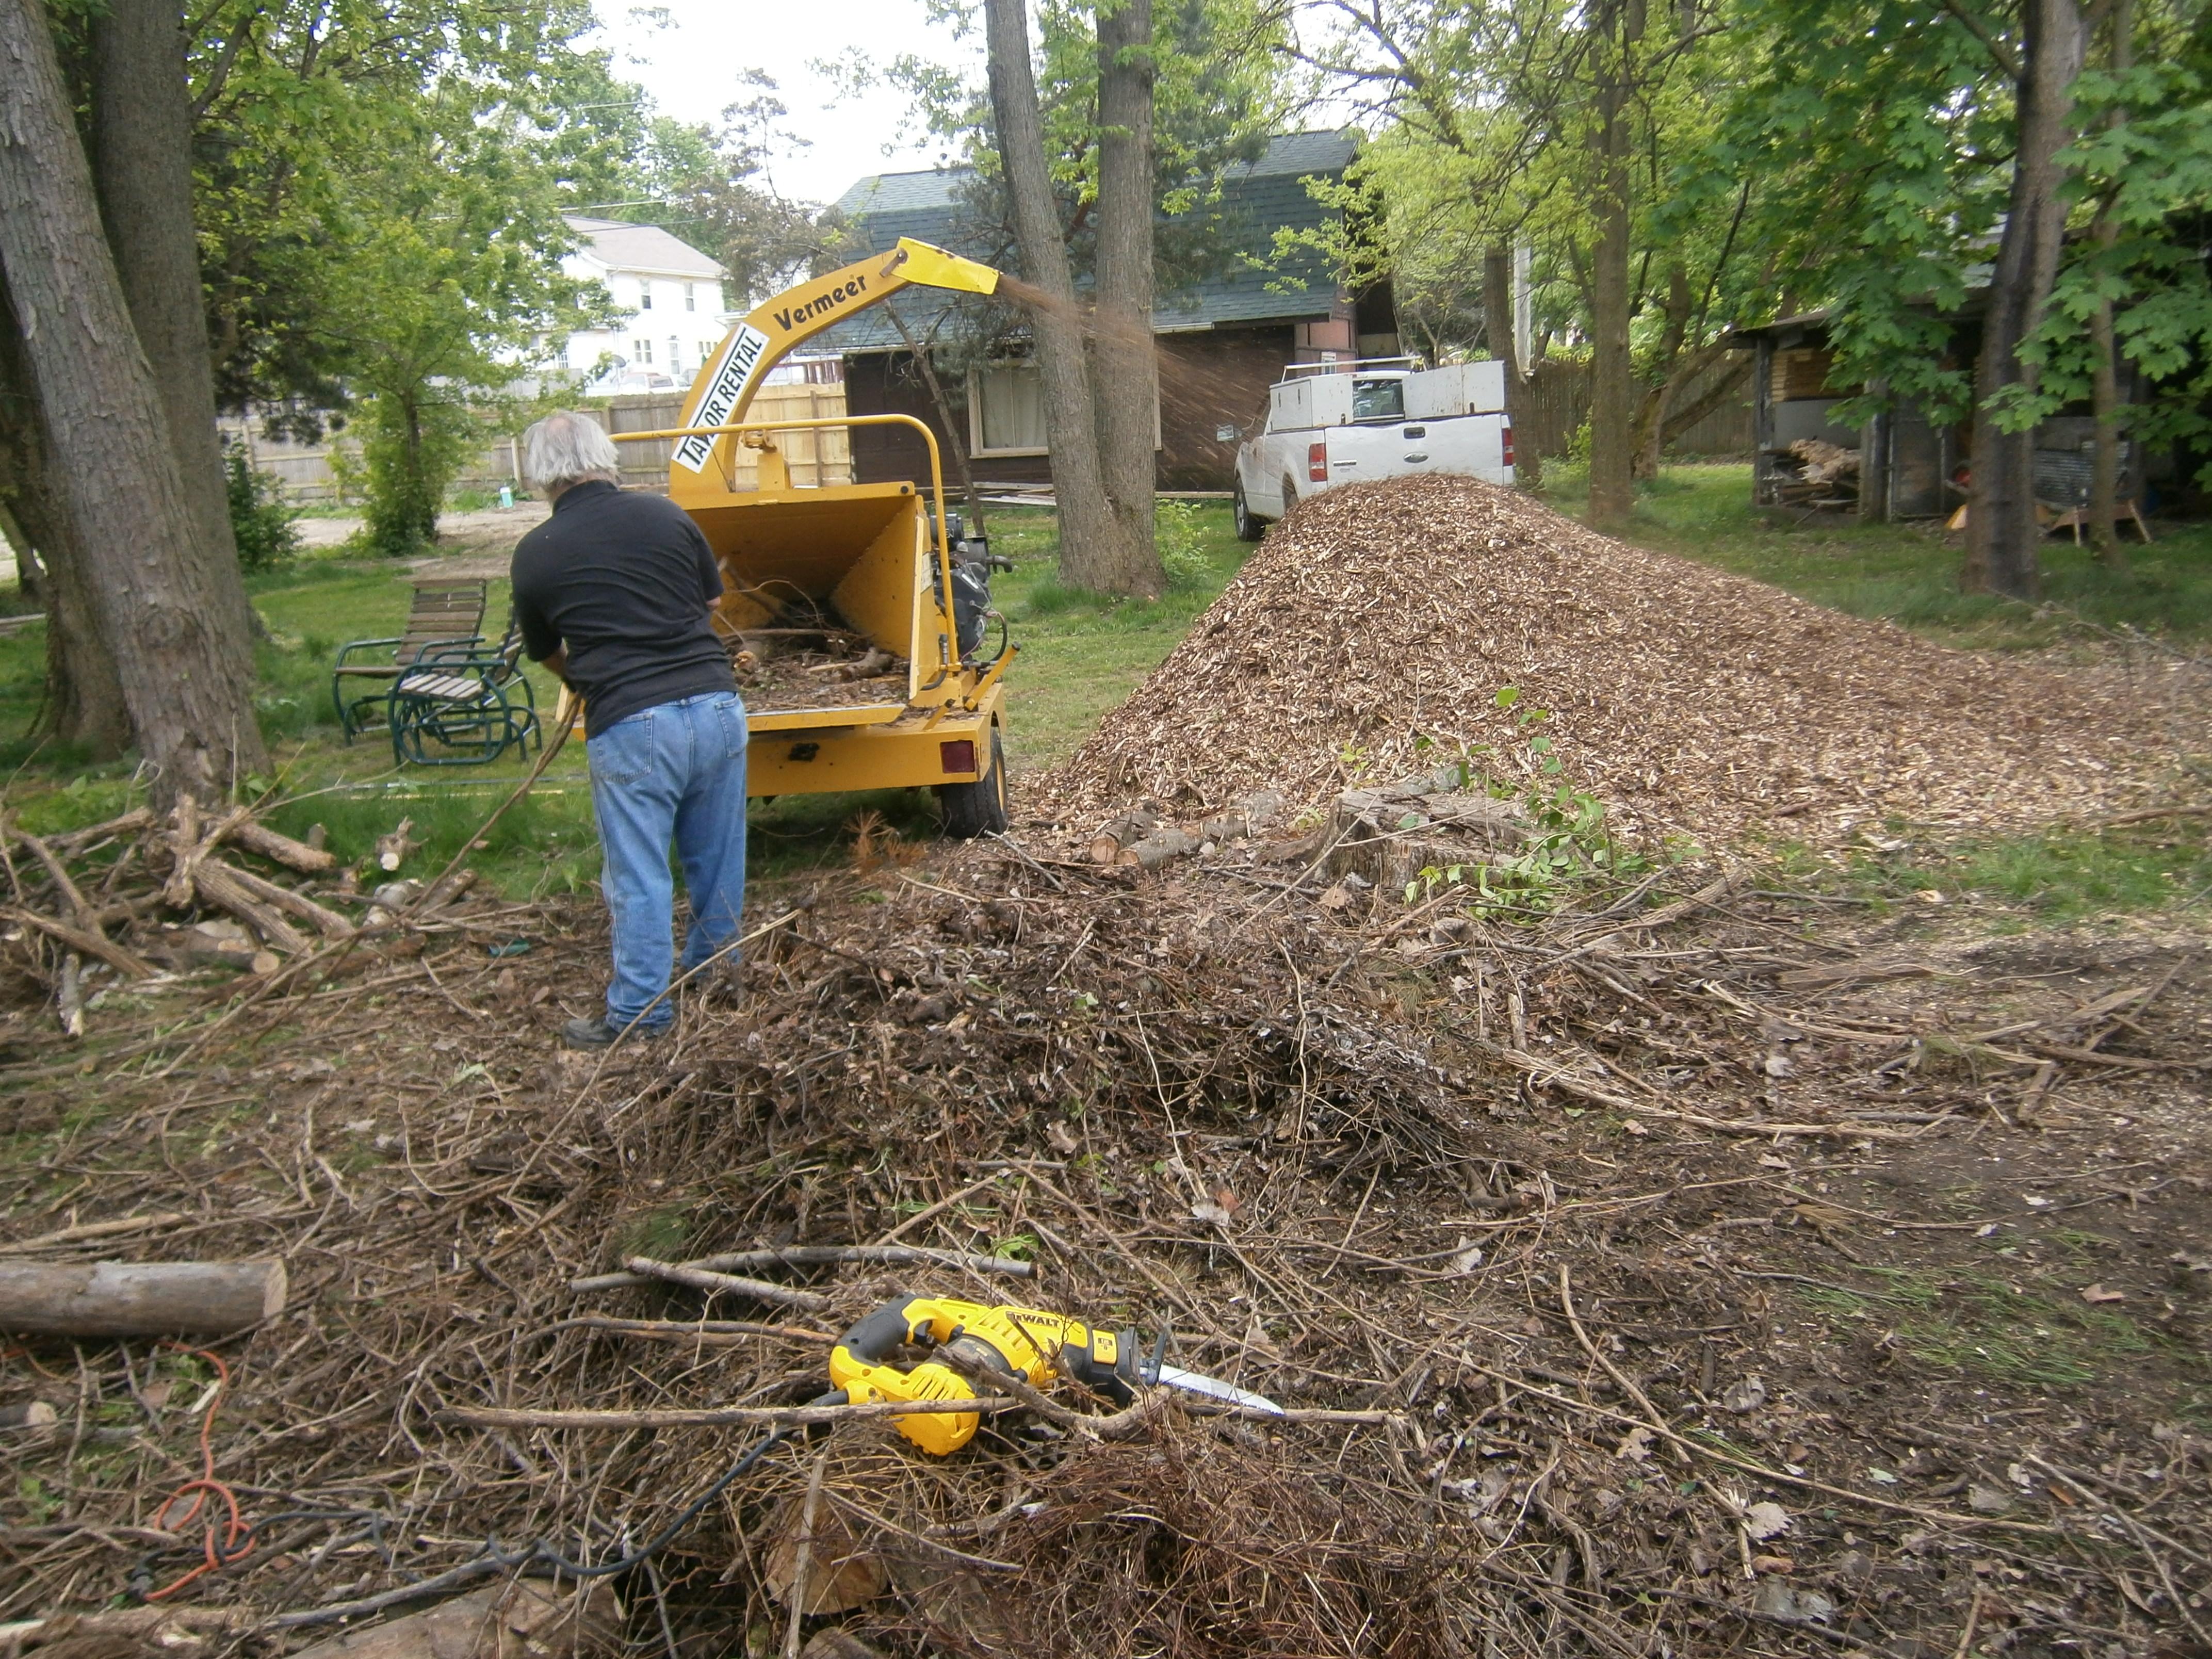 Tim shreds logs at Mary's Glen